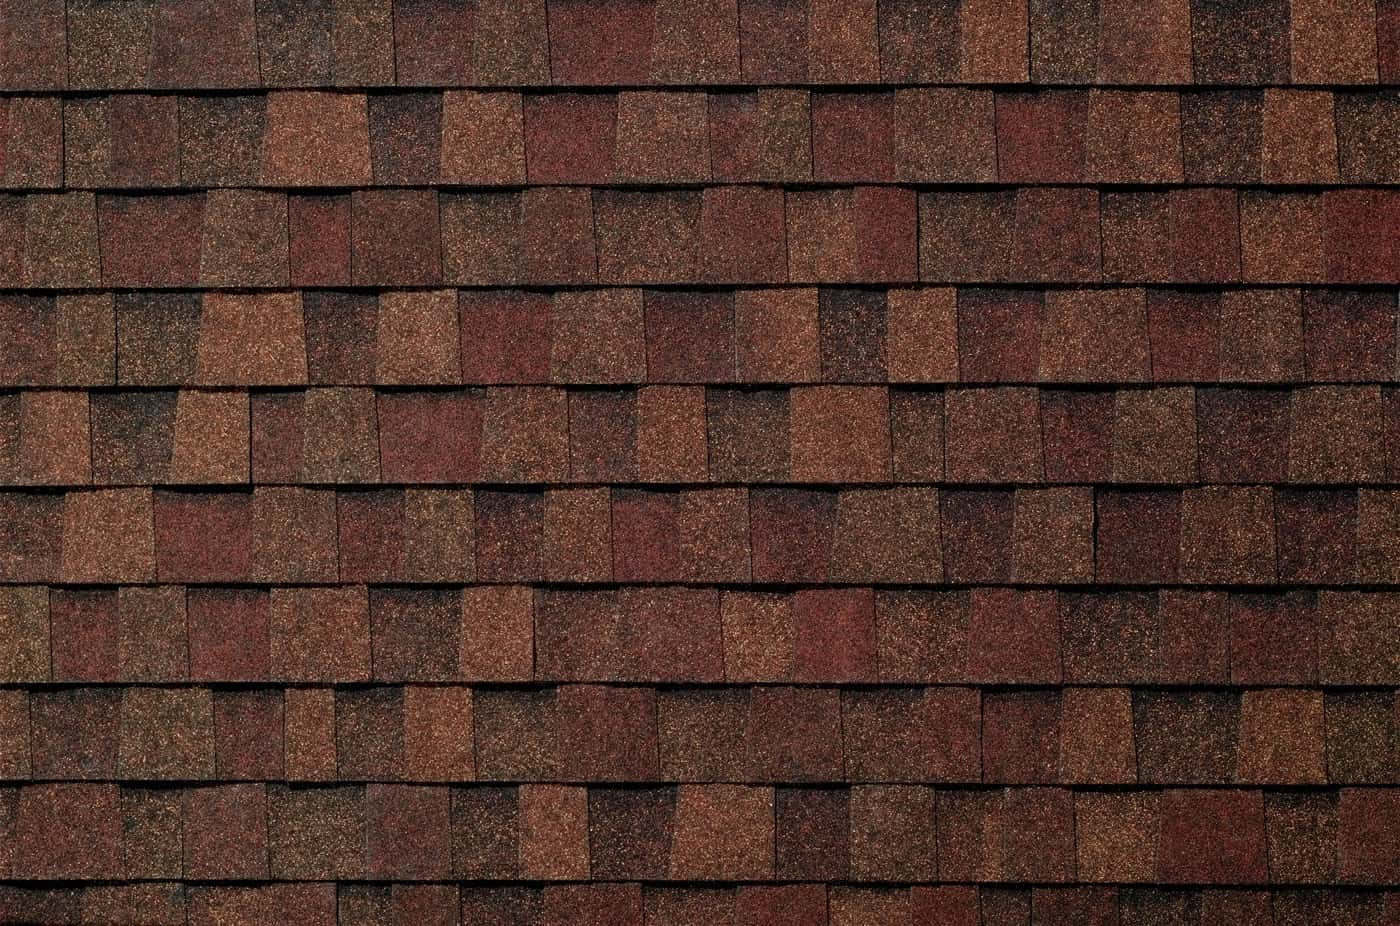 Heritage Rustic Redwood